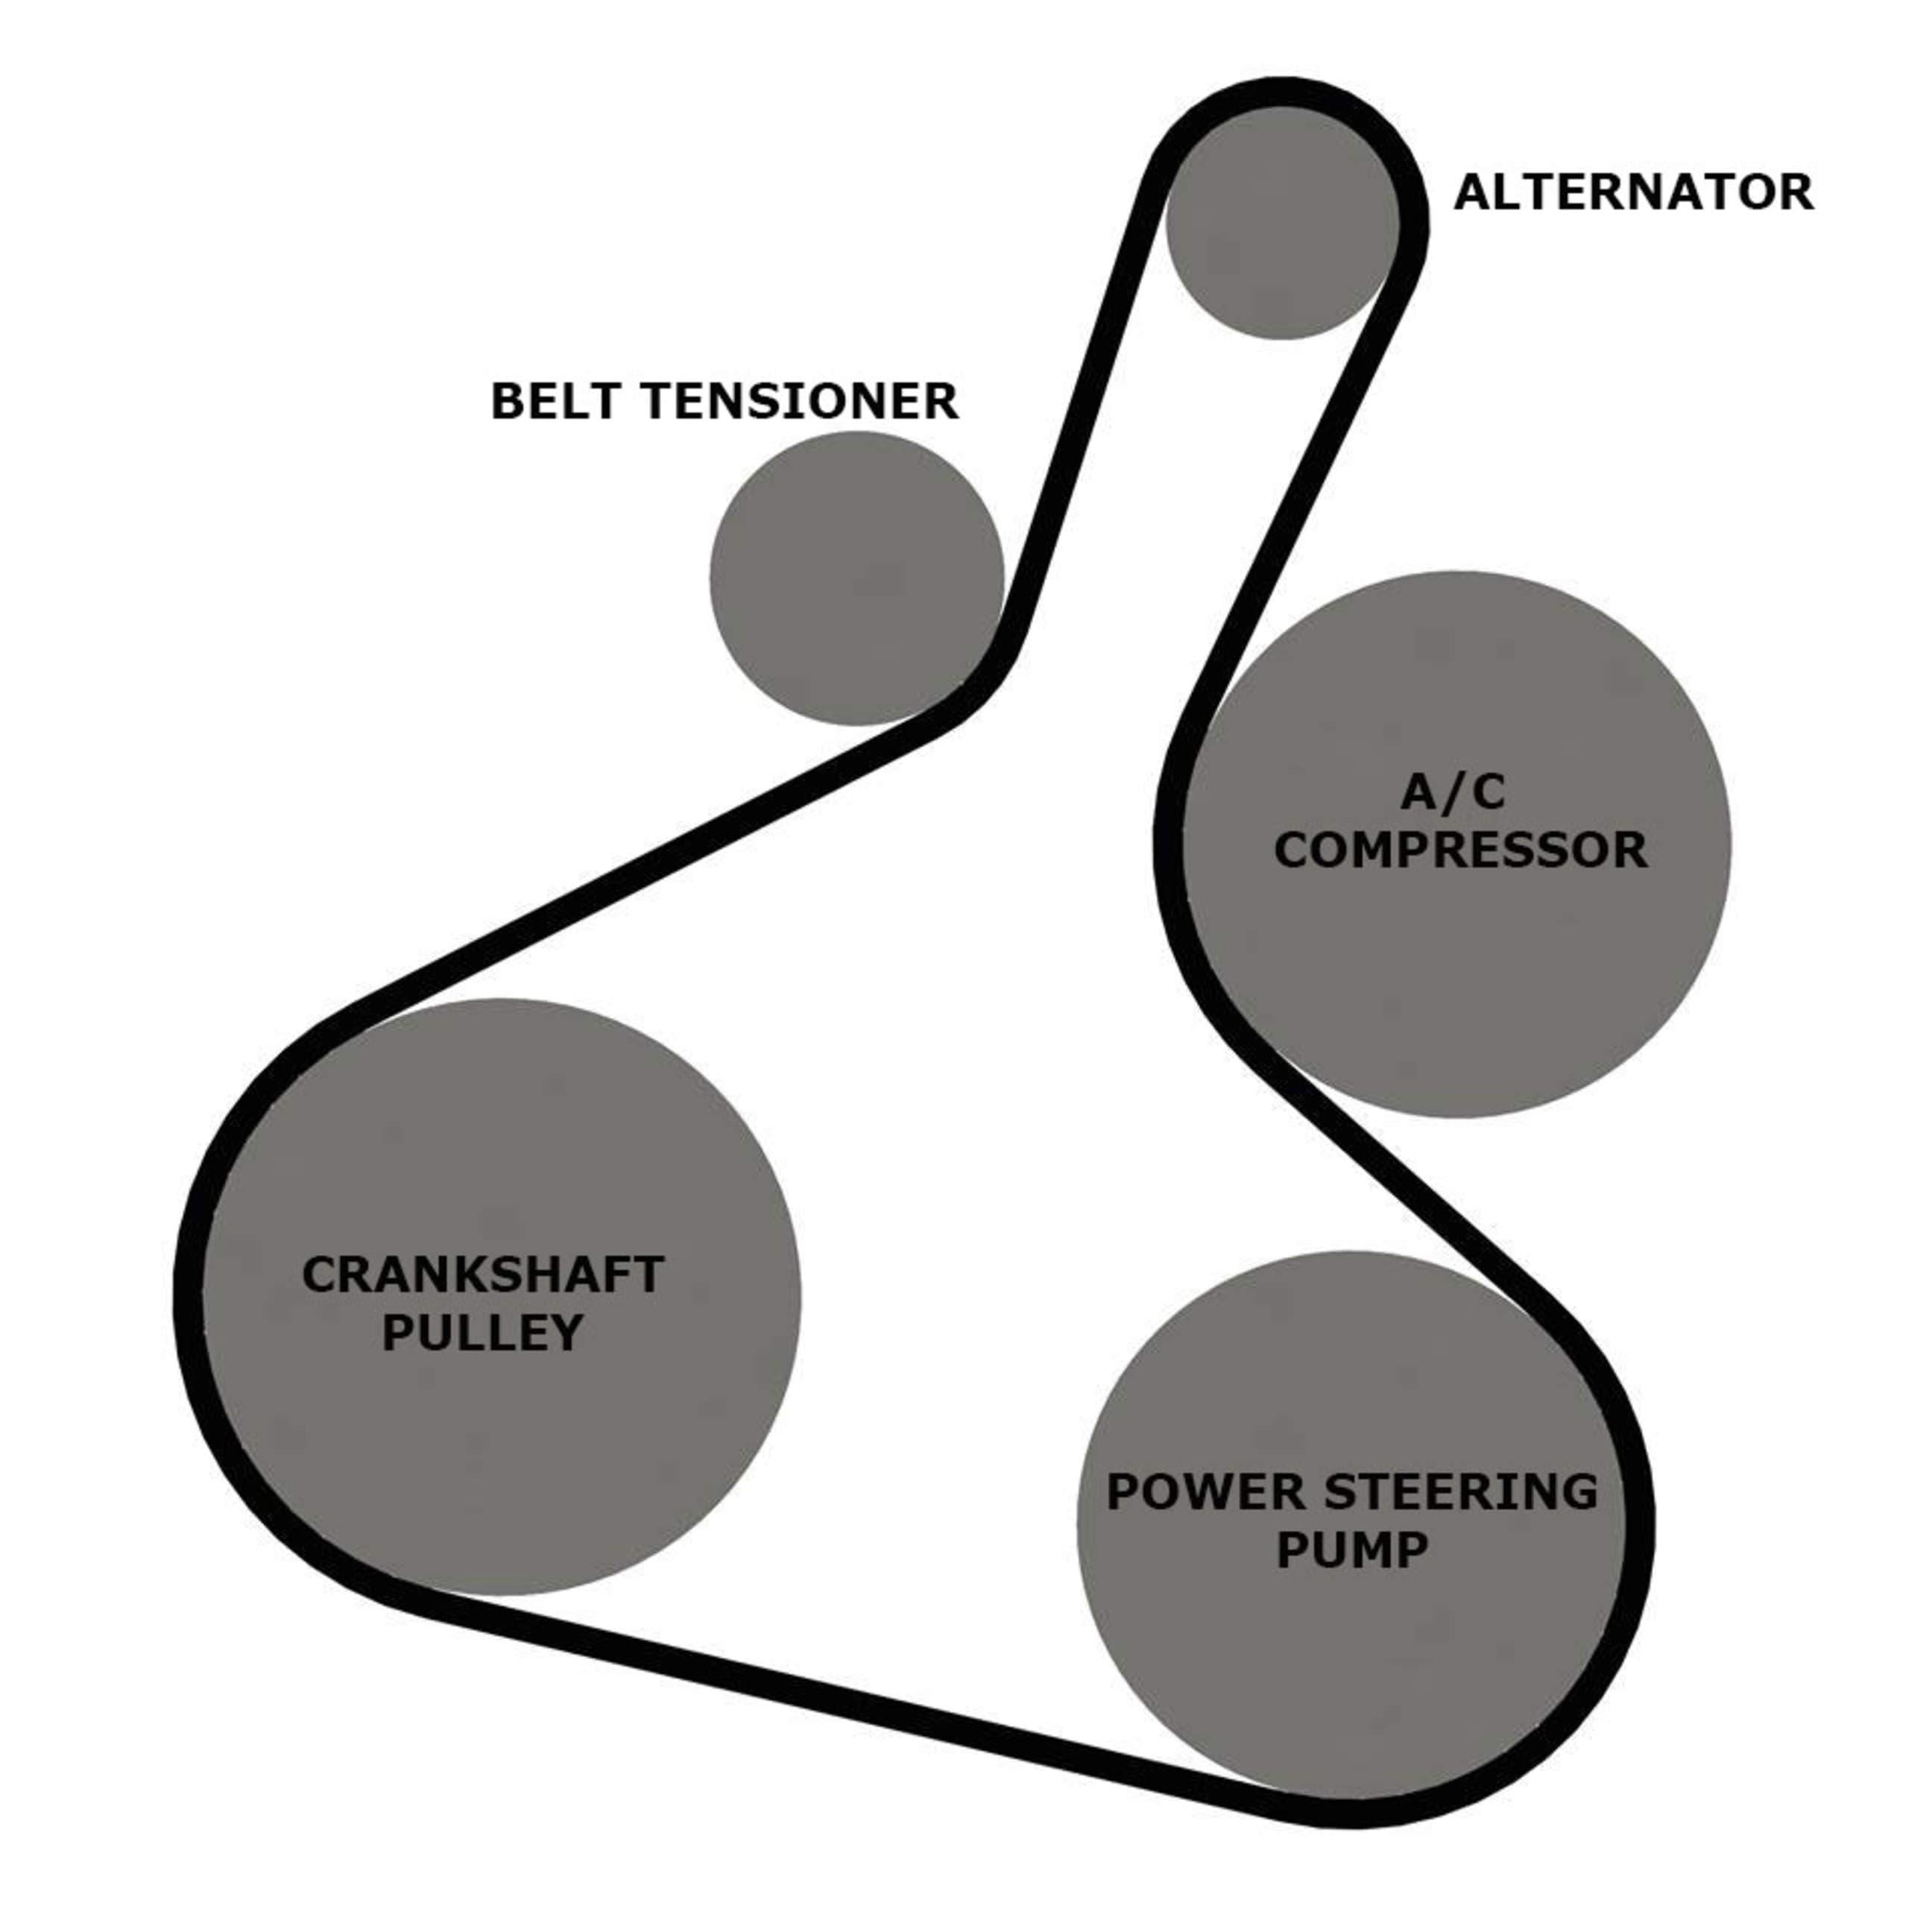 2000 Vw Jetta 2 0 Engine Diagram General Wiring Diagram Rush Thumb Rush Thumb Justrollingwith It